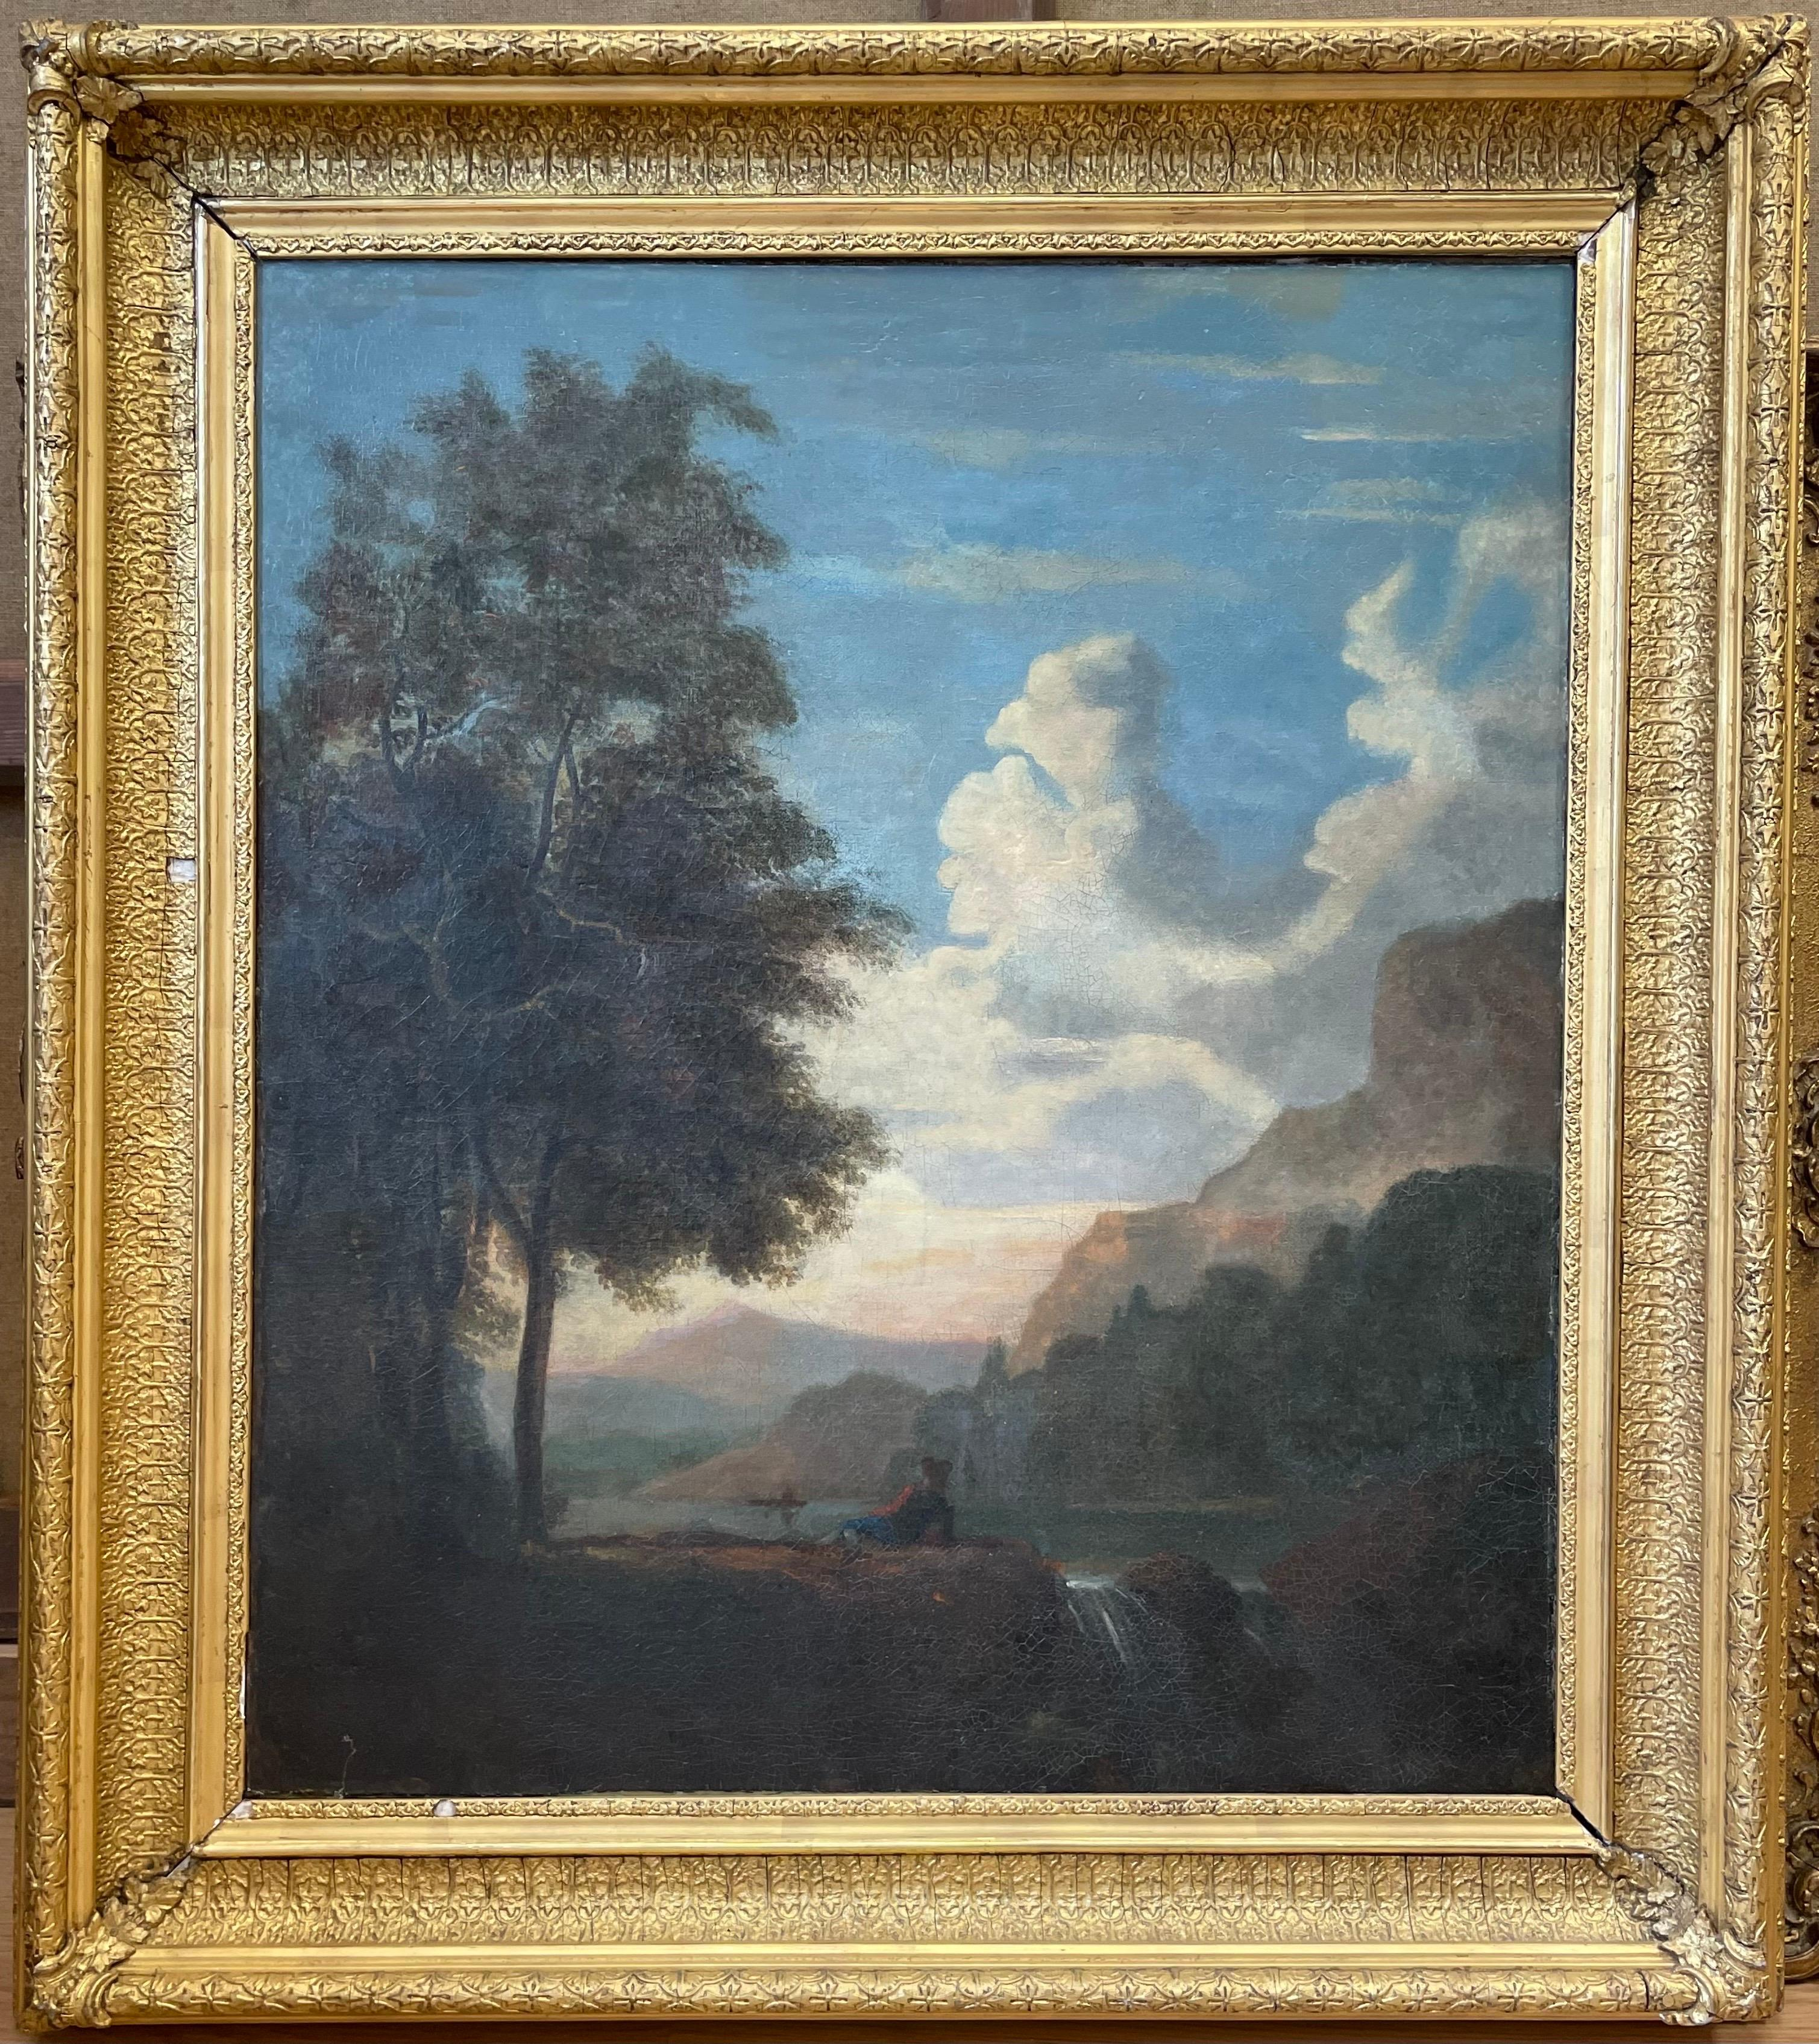 FINE 18thC ITALIAN OLD MASTER OIL PAINTING - FIGURE RESTING BEFORE SUNSET LAKE